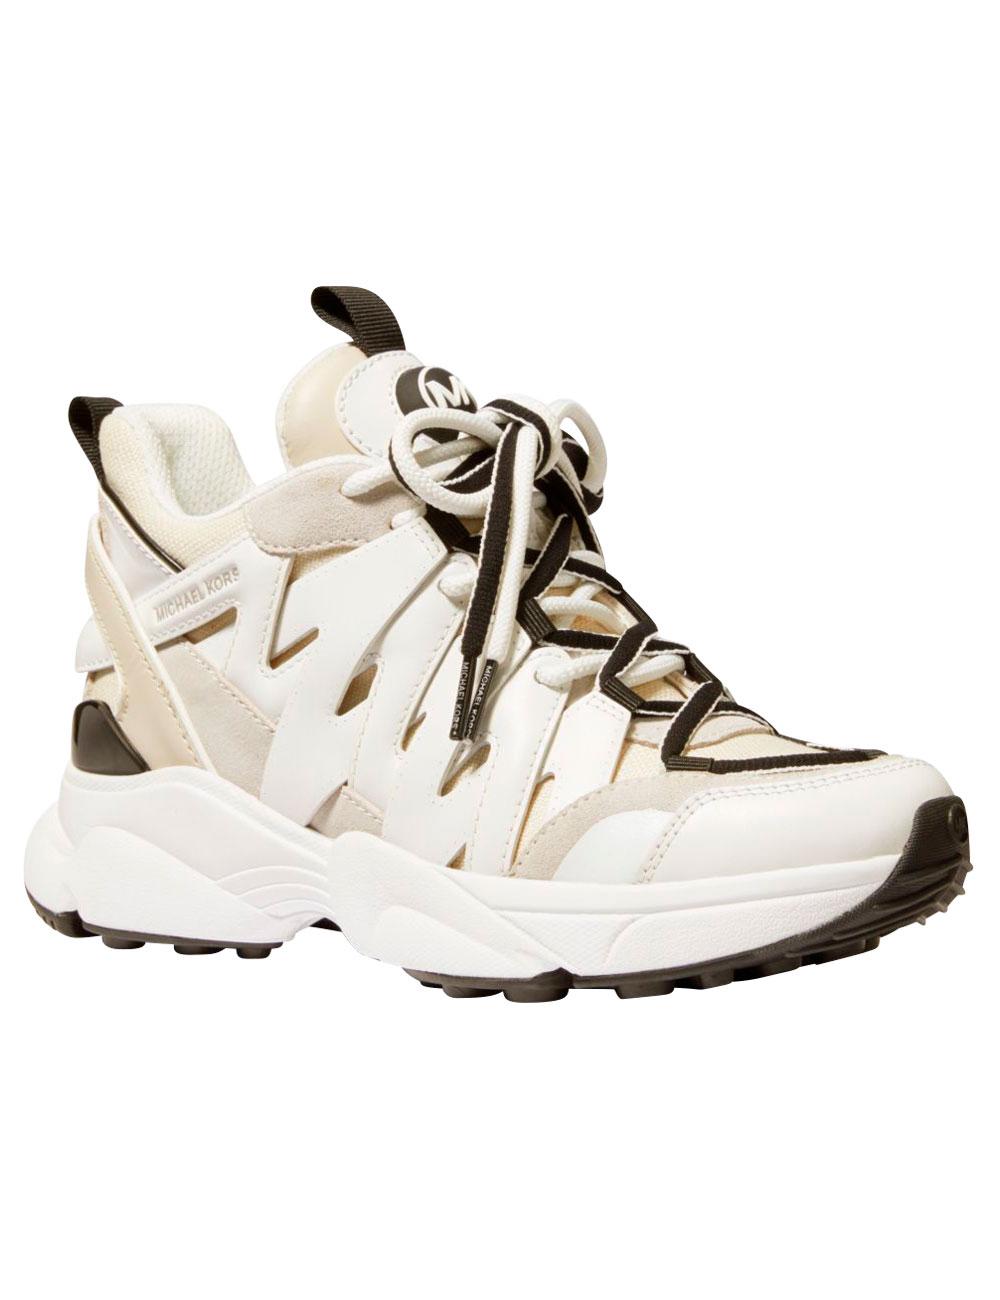 Michael Kors Sneakers «Hero», weiss/beige